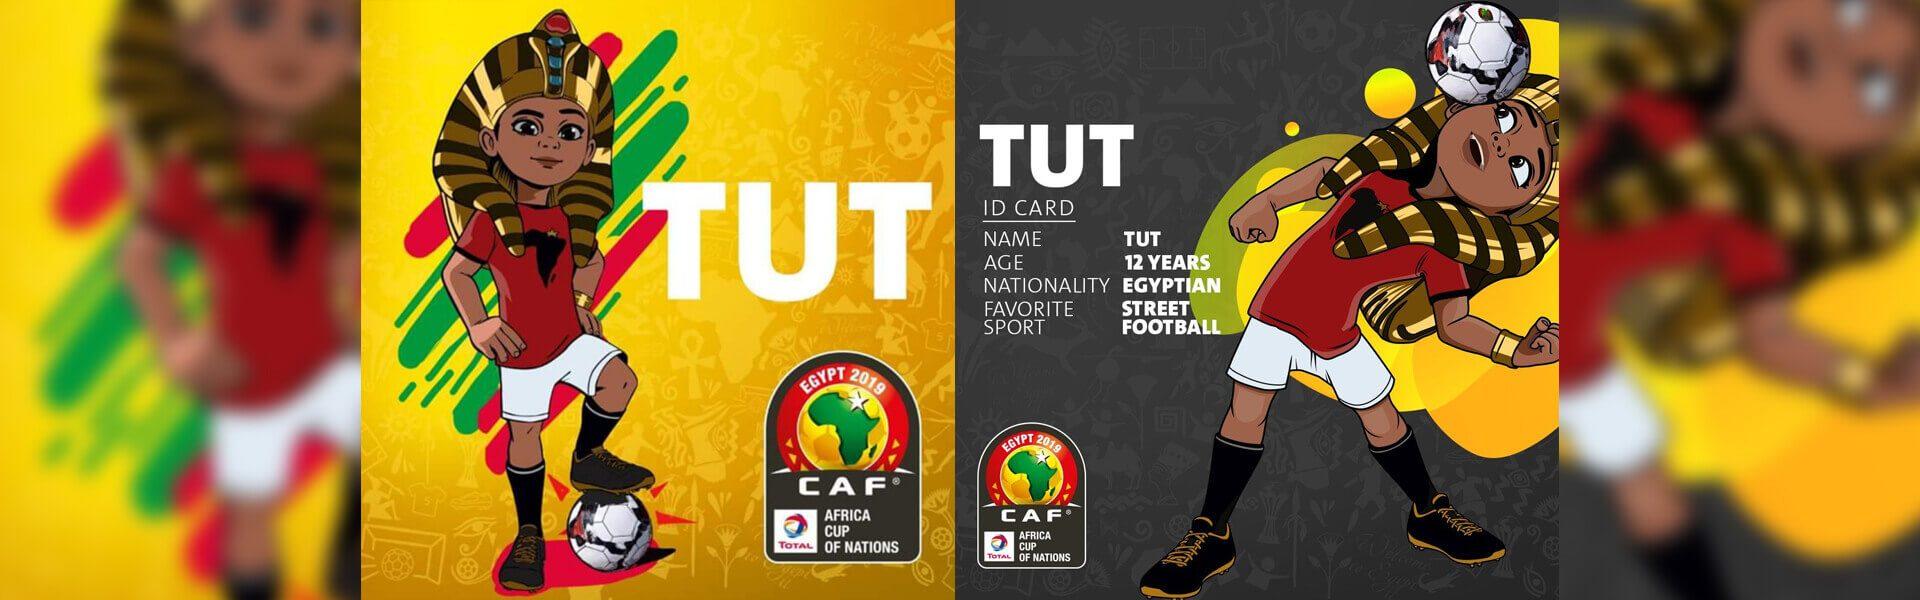 Mascotte CAN 2019 : Tut, le jeune pharaon à la CAN